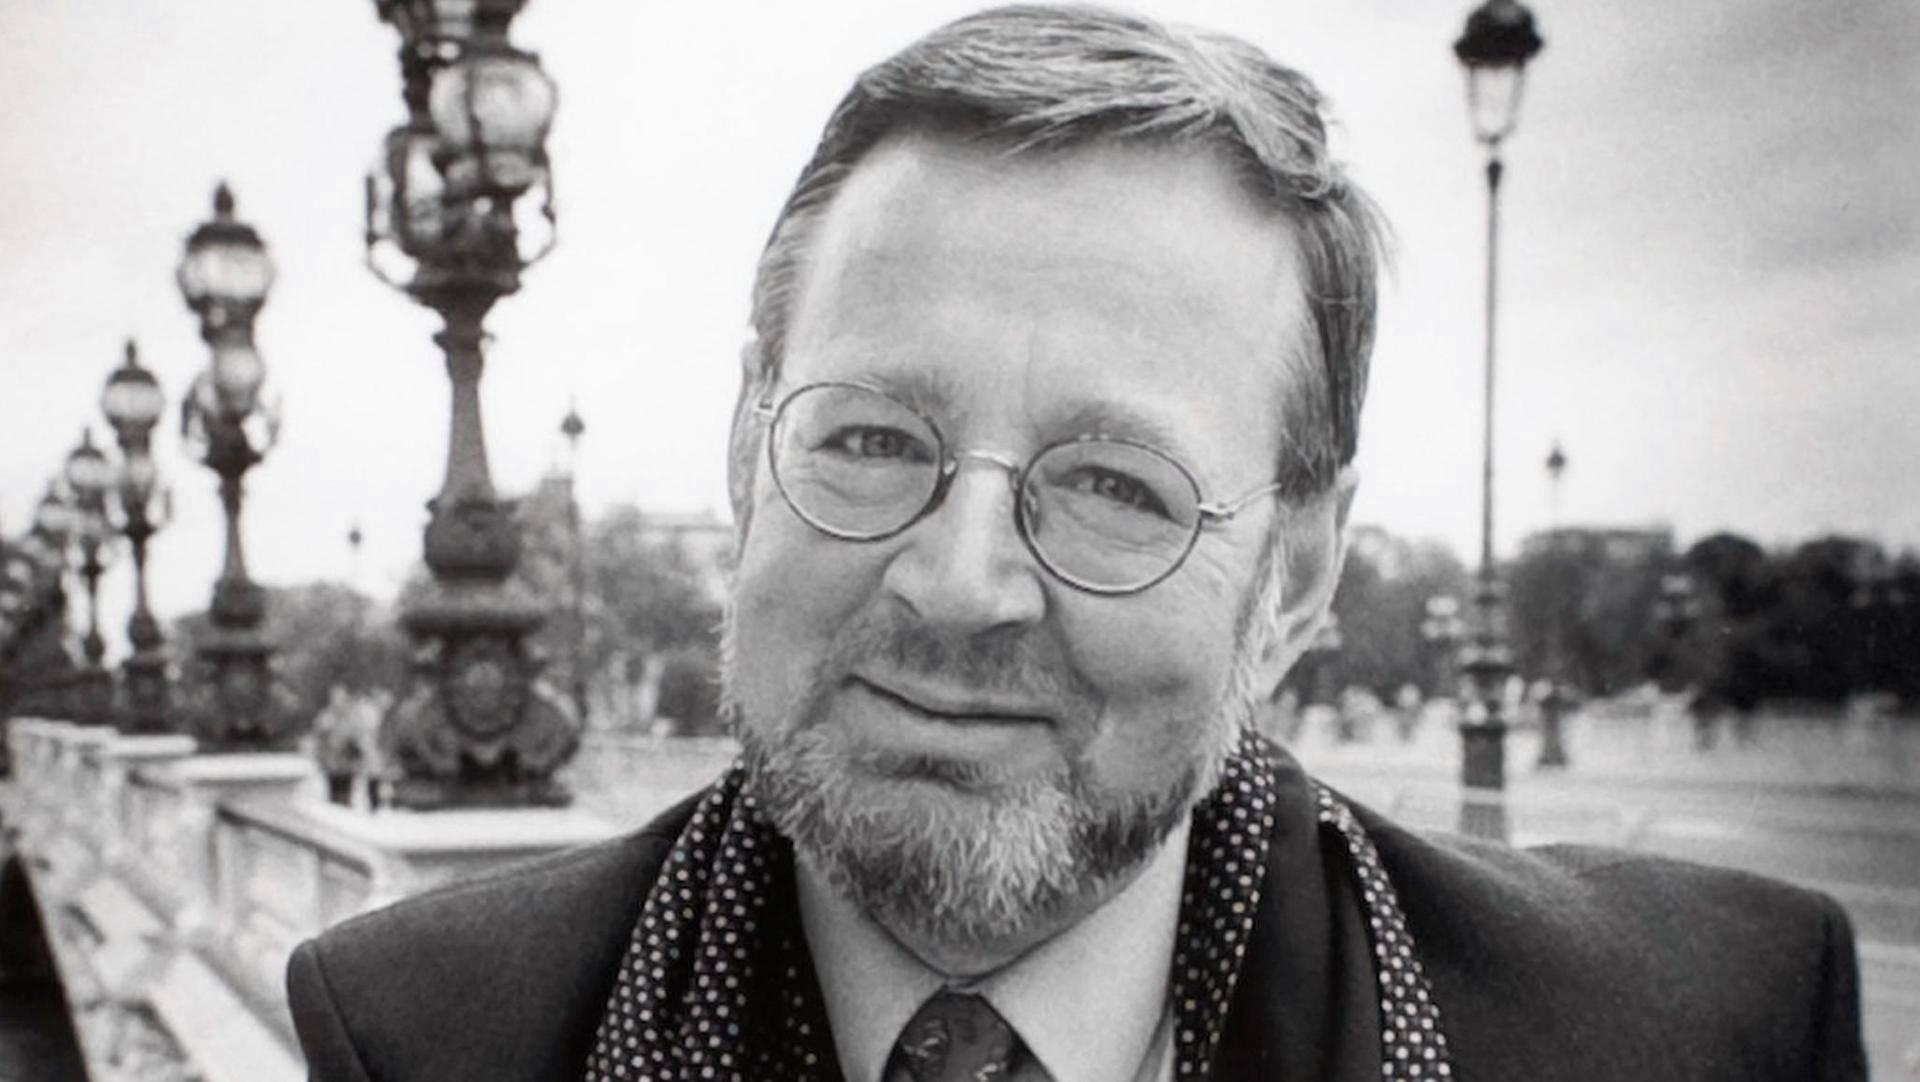 Antti Hynninen